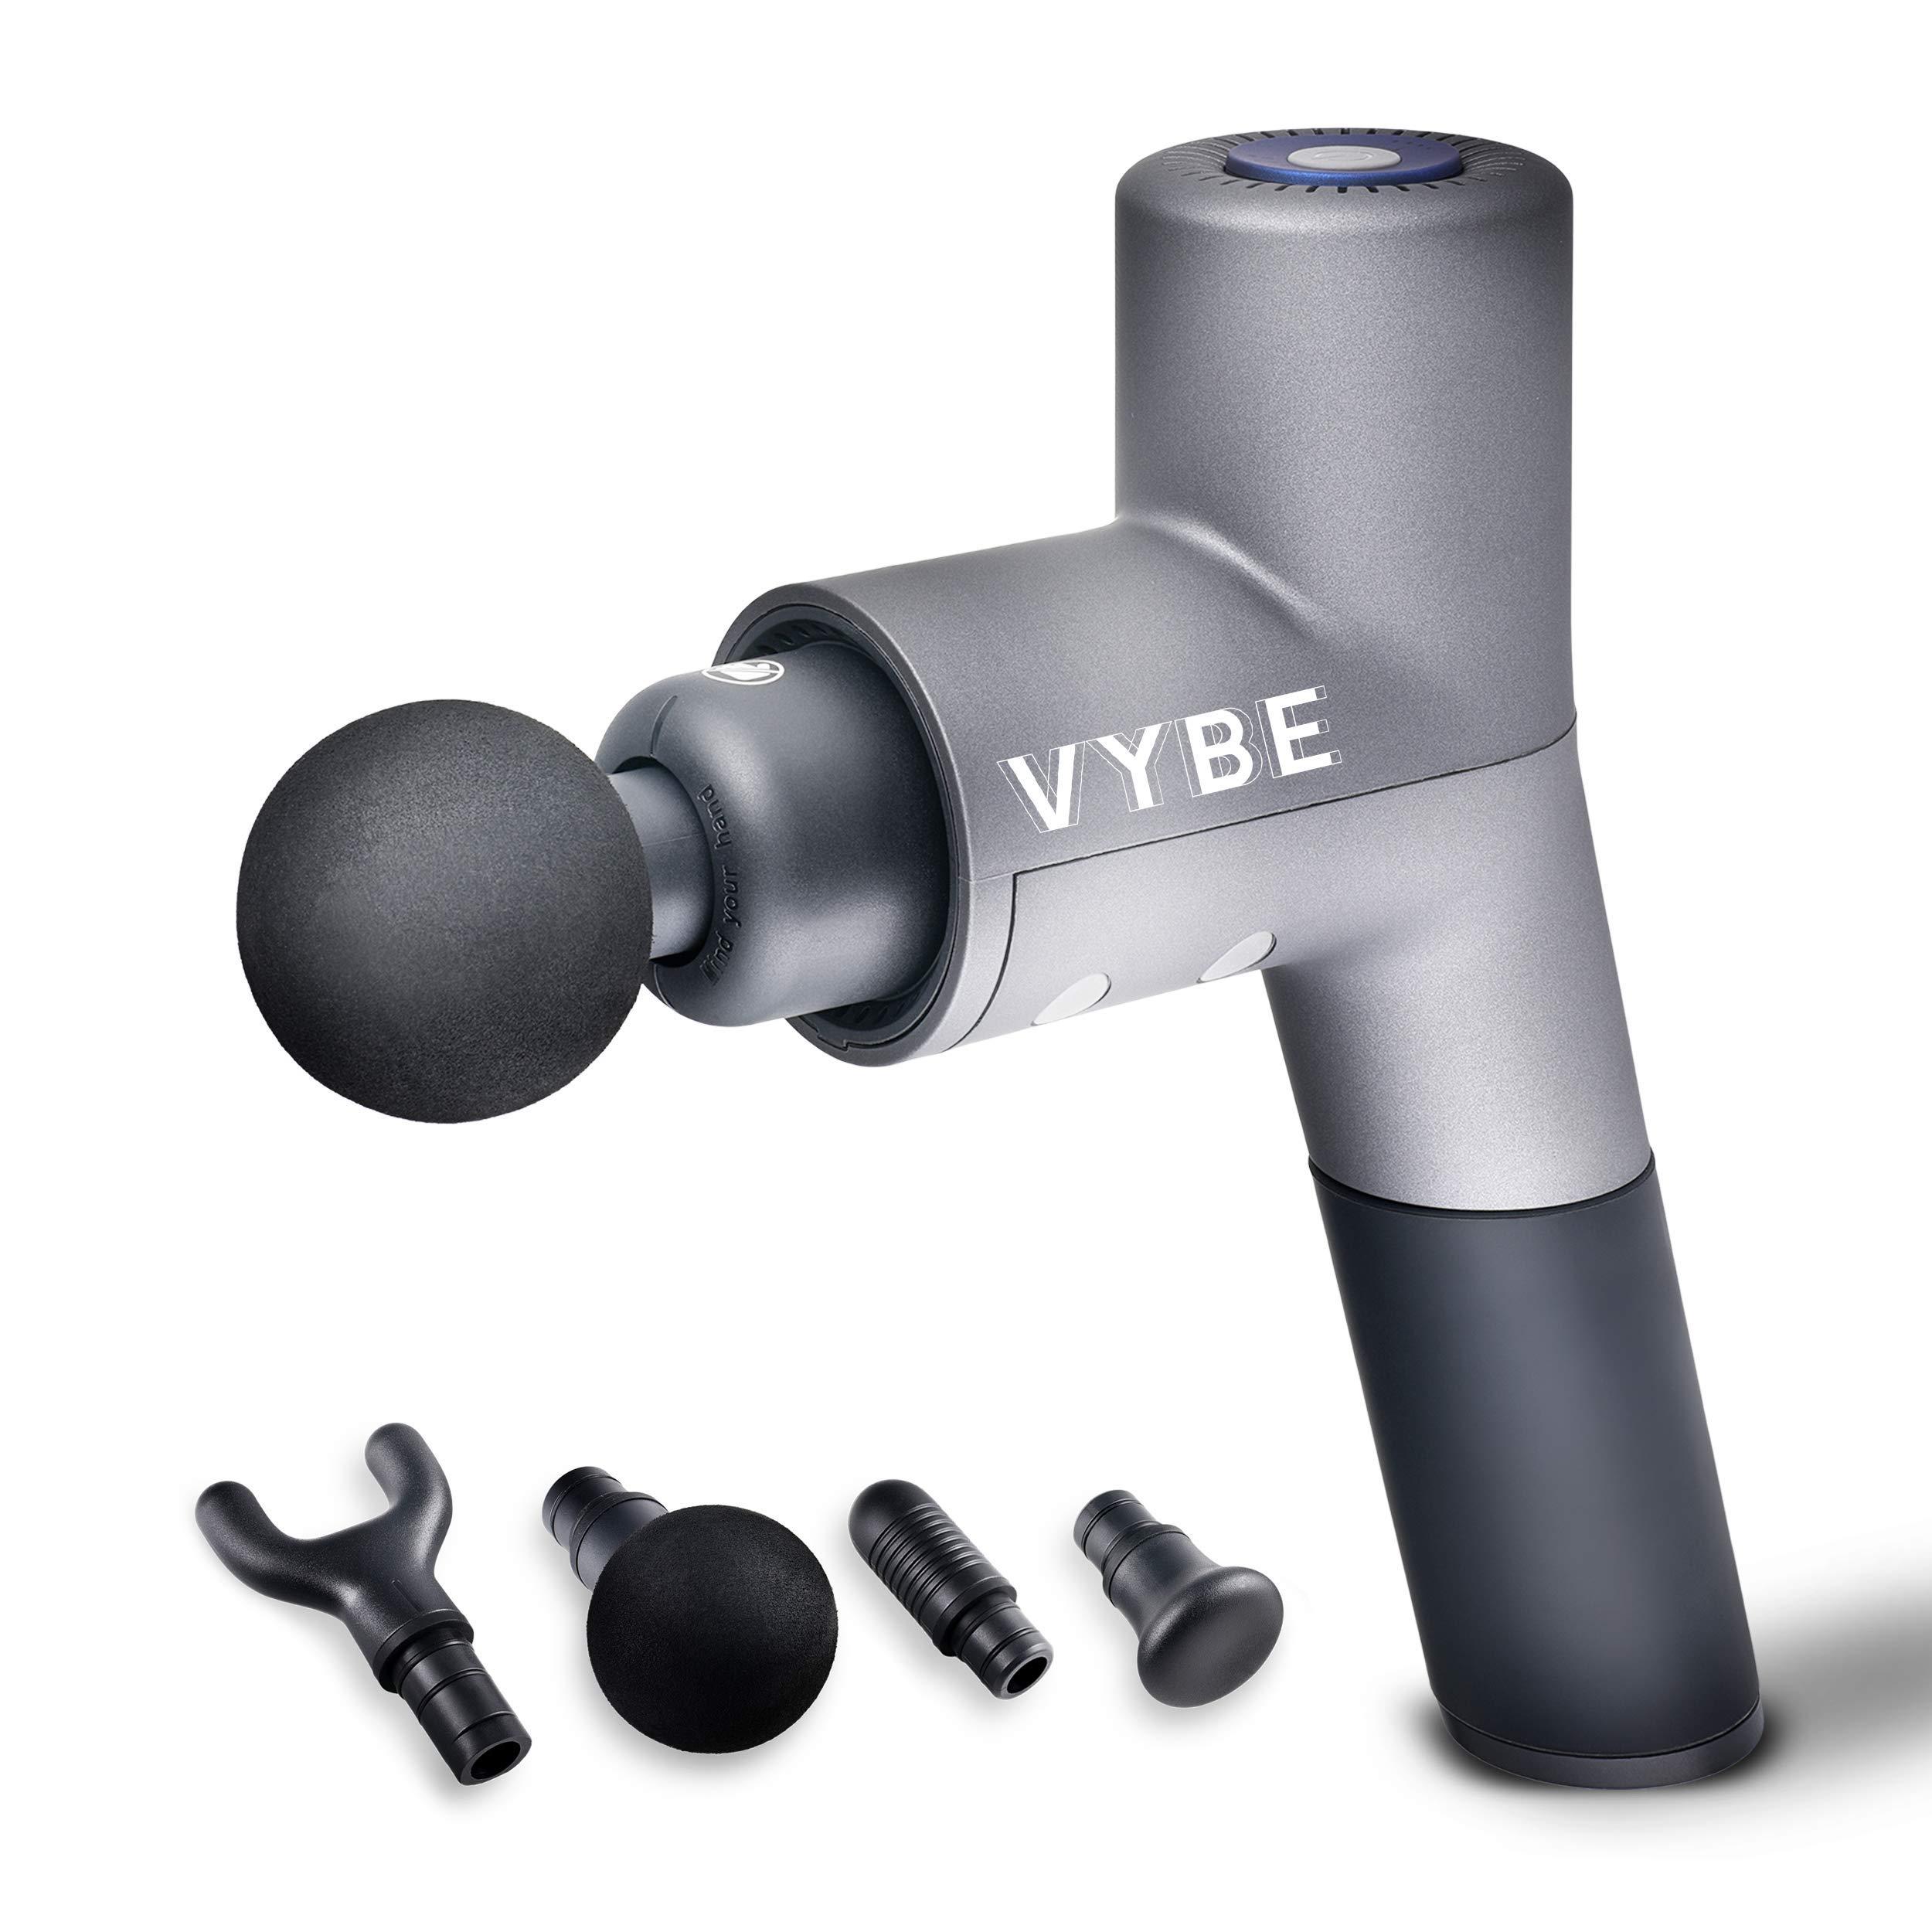 Quiet Professional Percussion Massage Gun - Vybe PRO Premium Handheld Deep Muscle Massager